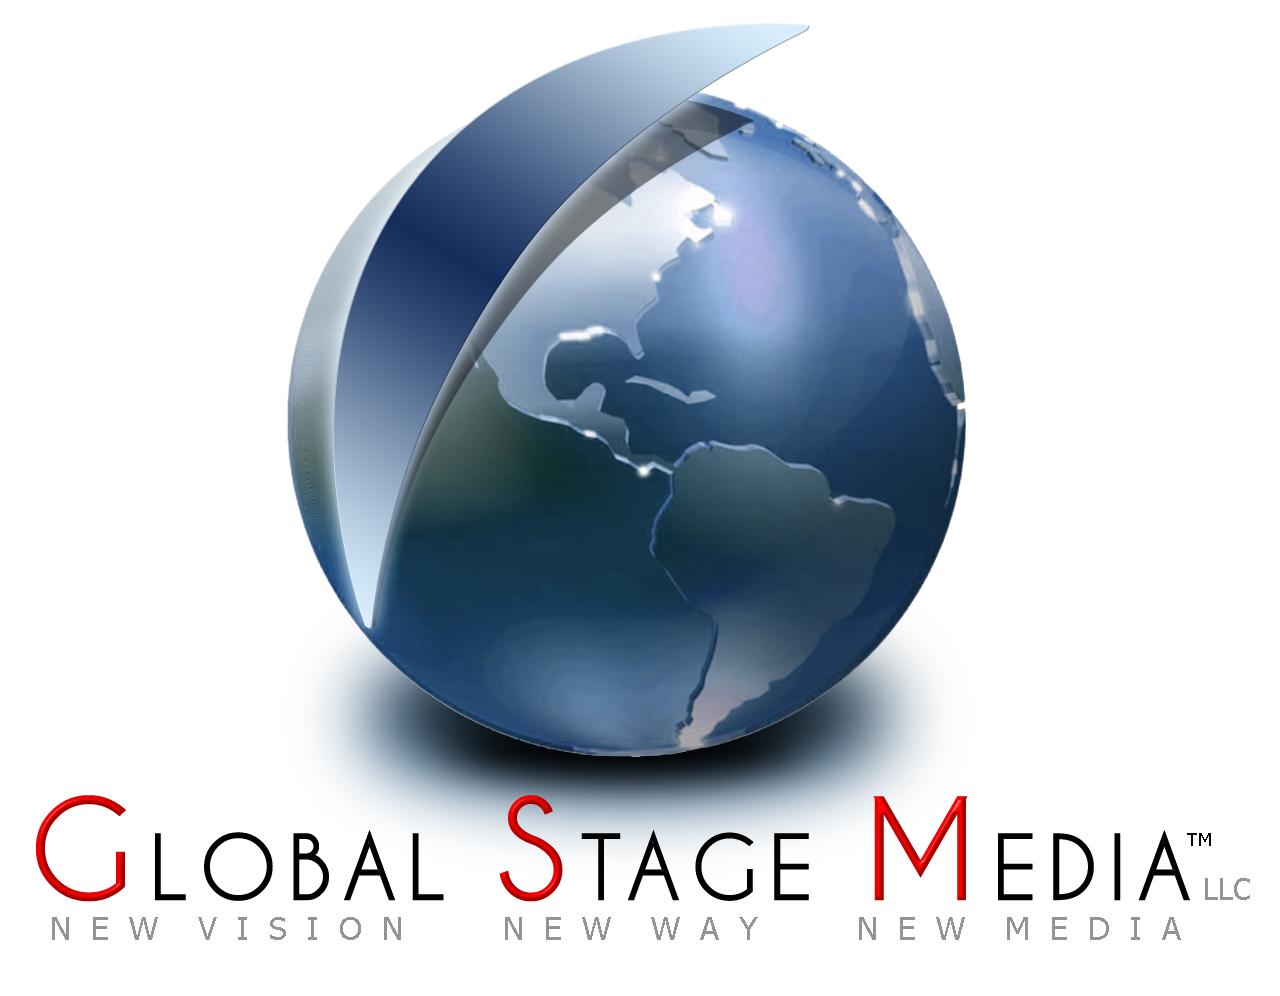 Global Stage Media, LLC